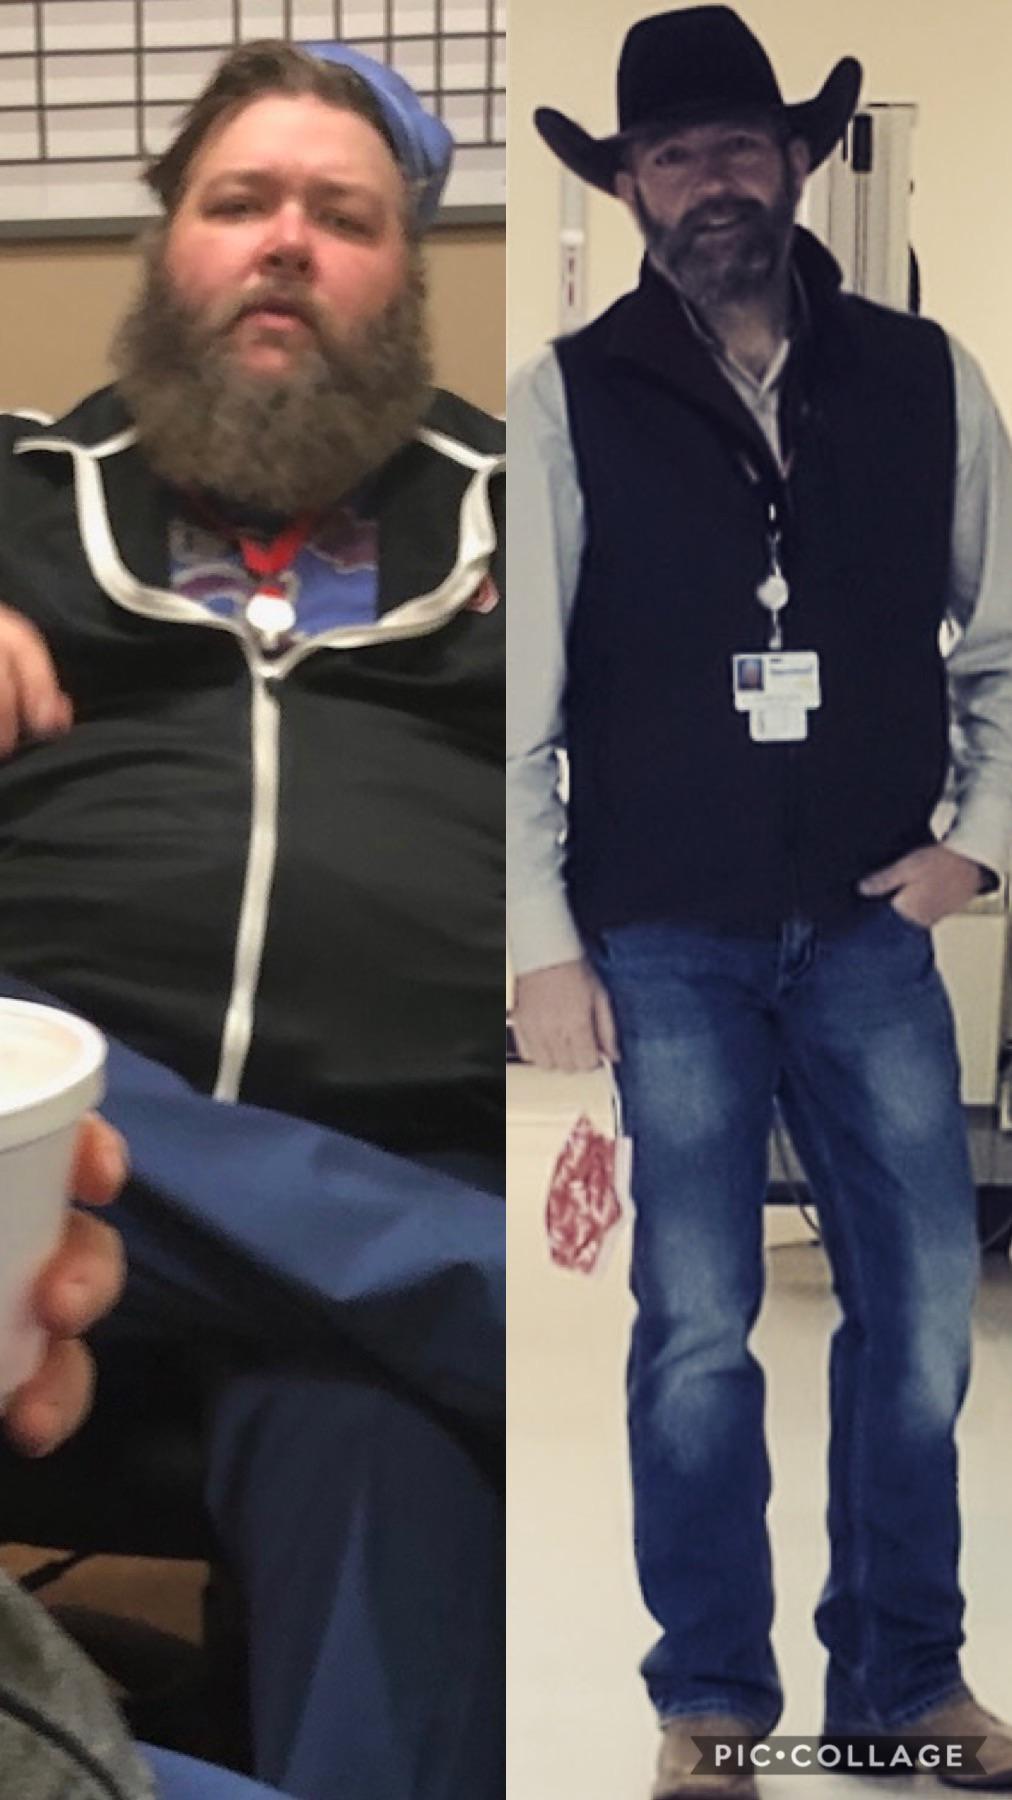 225 lbs Weight Loss 6'1 Male 428 lbs to 203 lbs